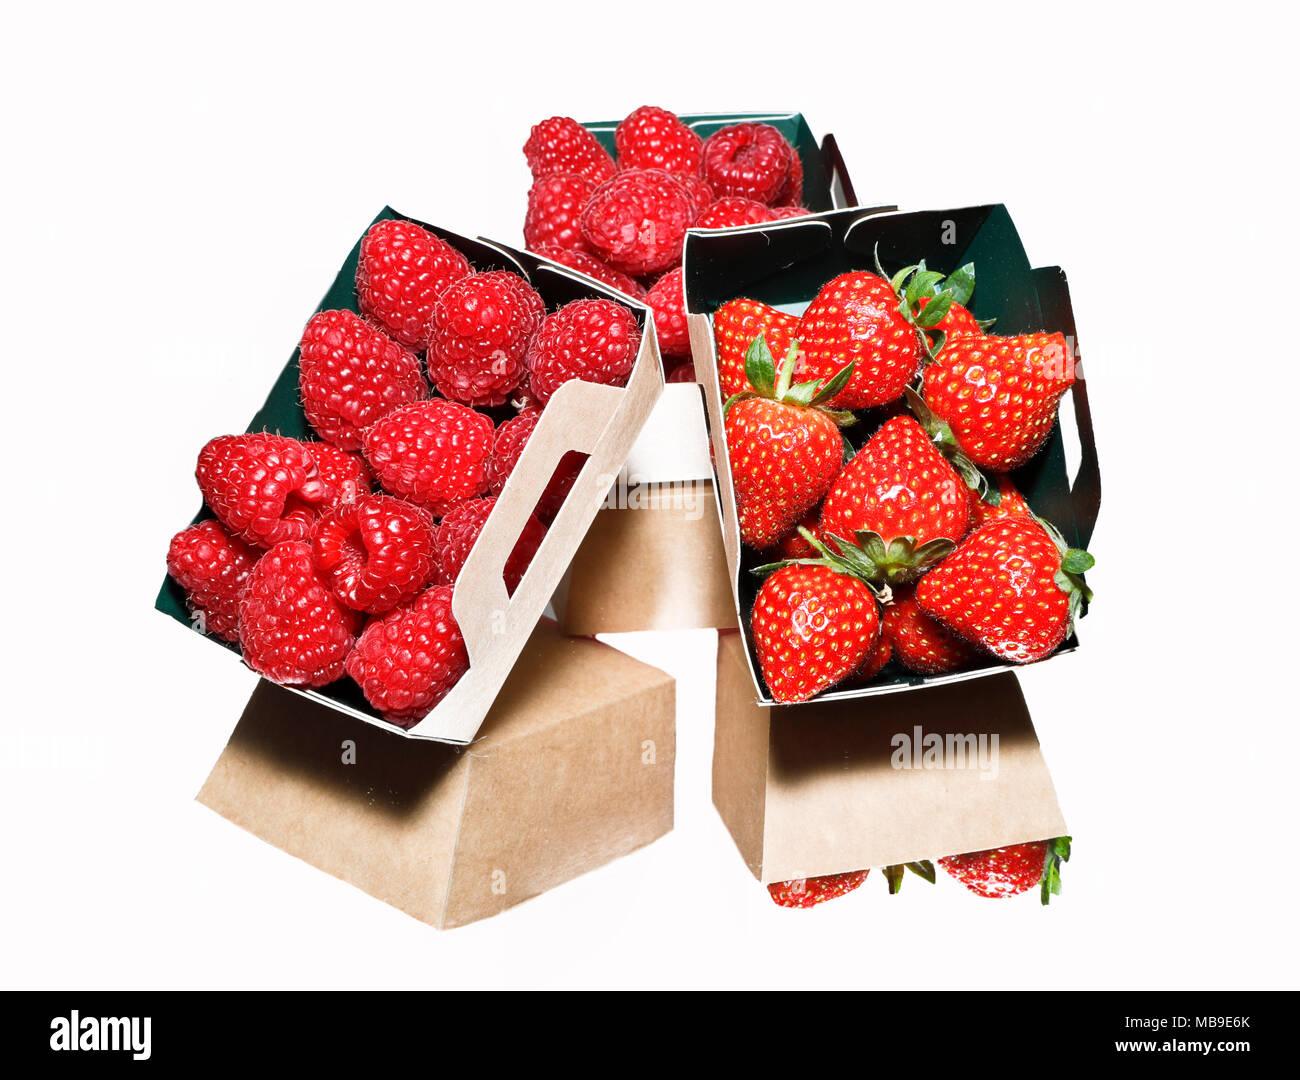 Fresh strawberries and raspberries on white background - Stock Image